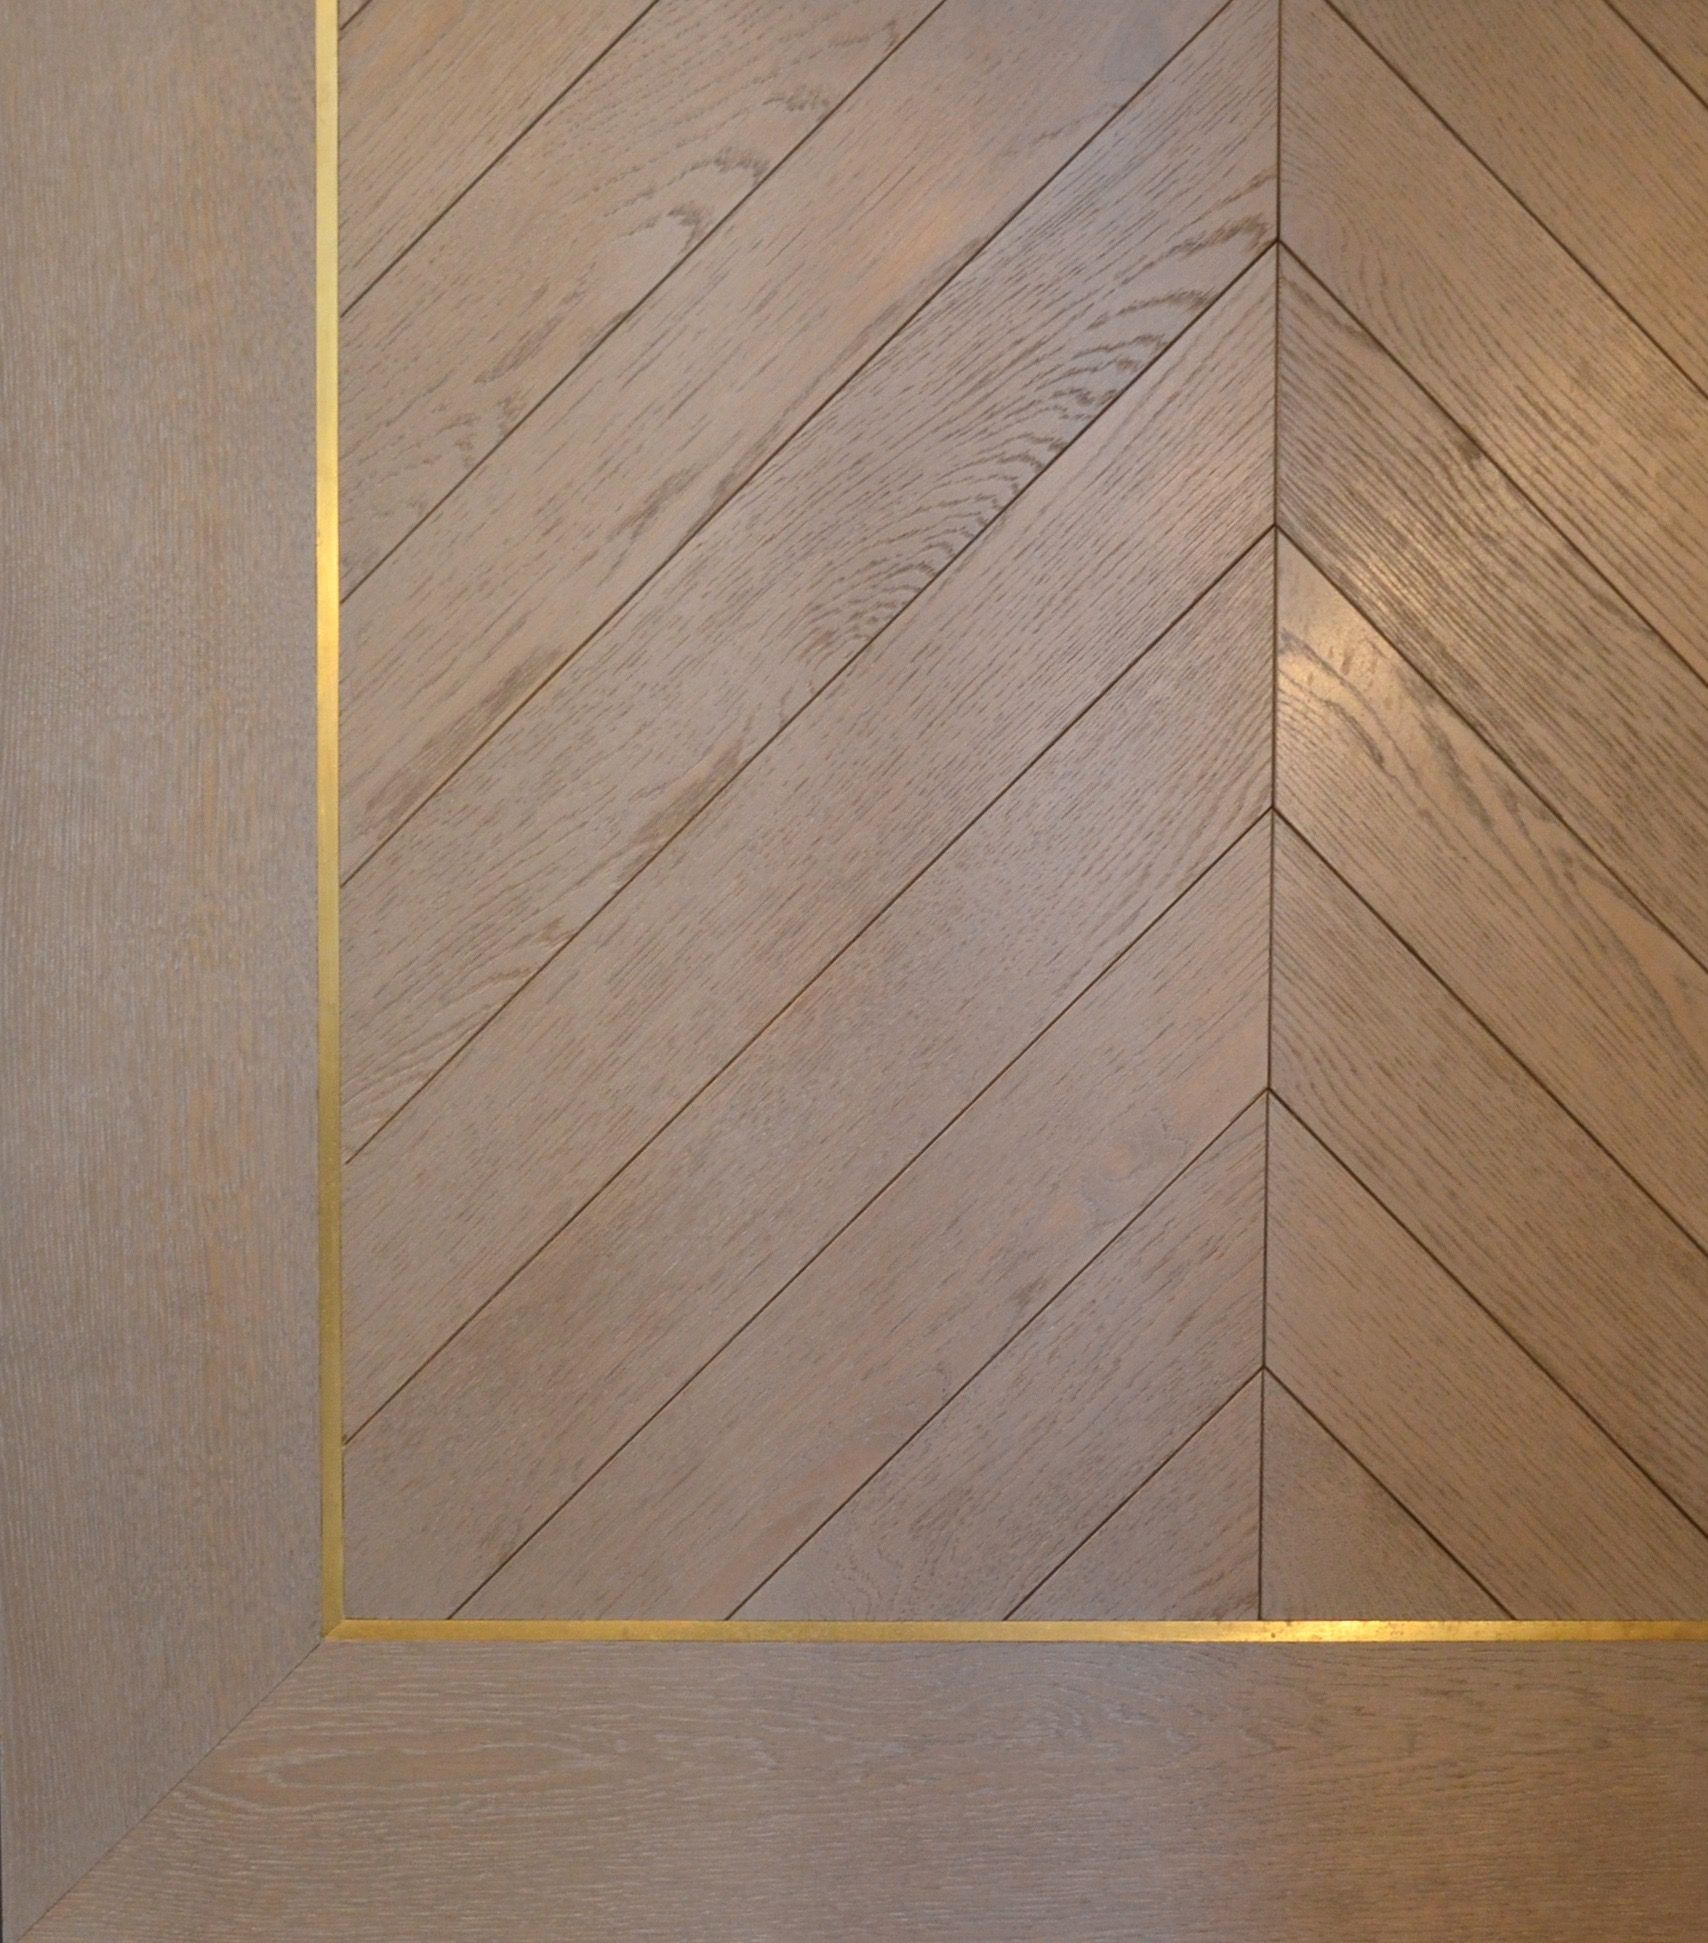 Marble Inlay Floor Gold : Oak chevron with brass inlay border designing borders